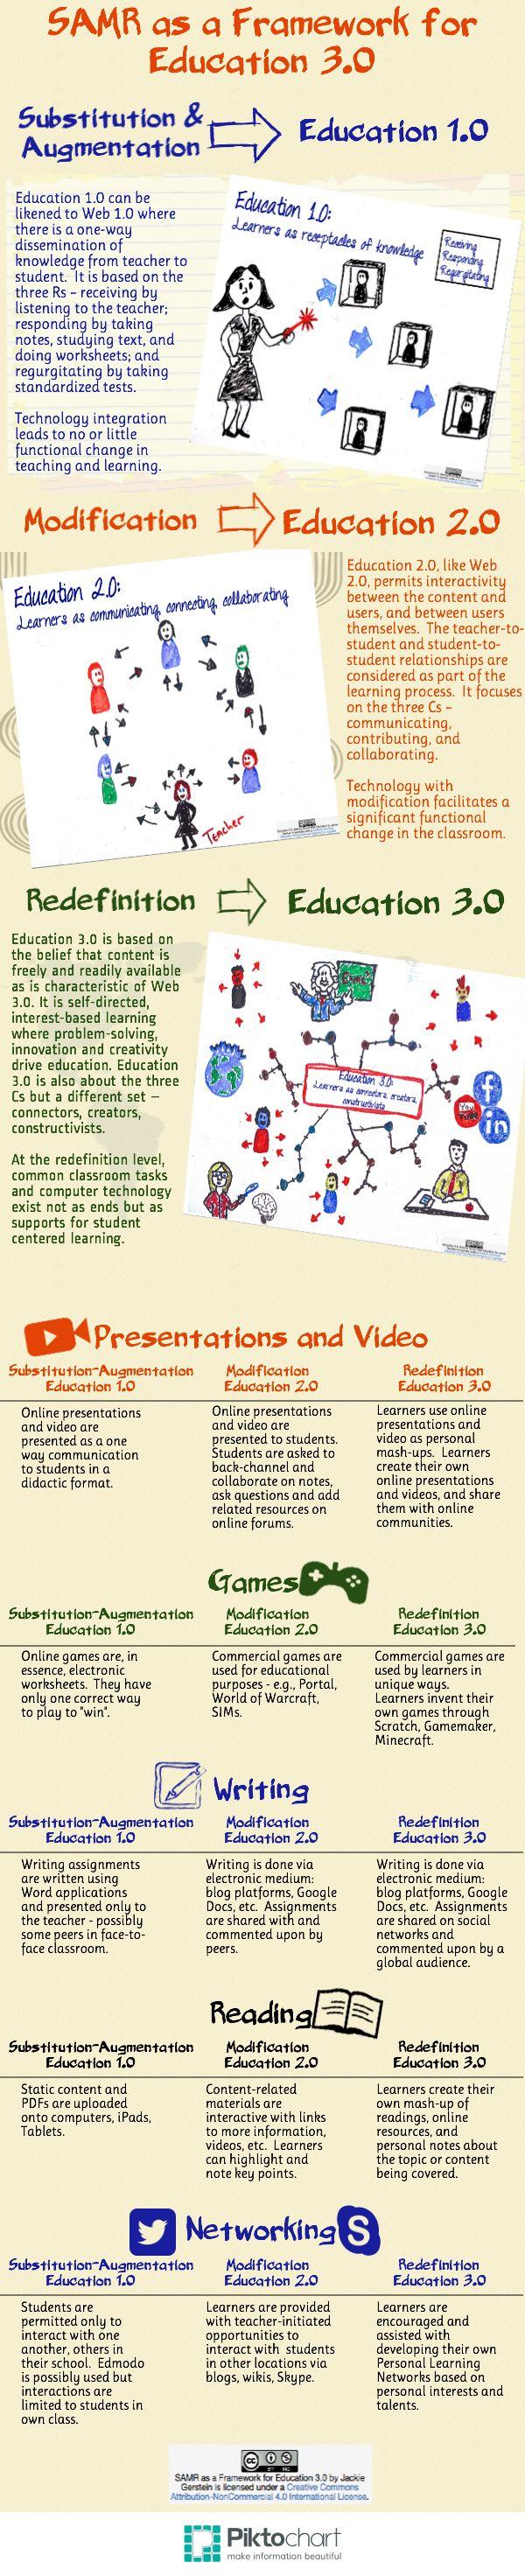 SAMR-Education3 | Barbers Hill ISD Technology Tools | Pinterest